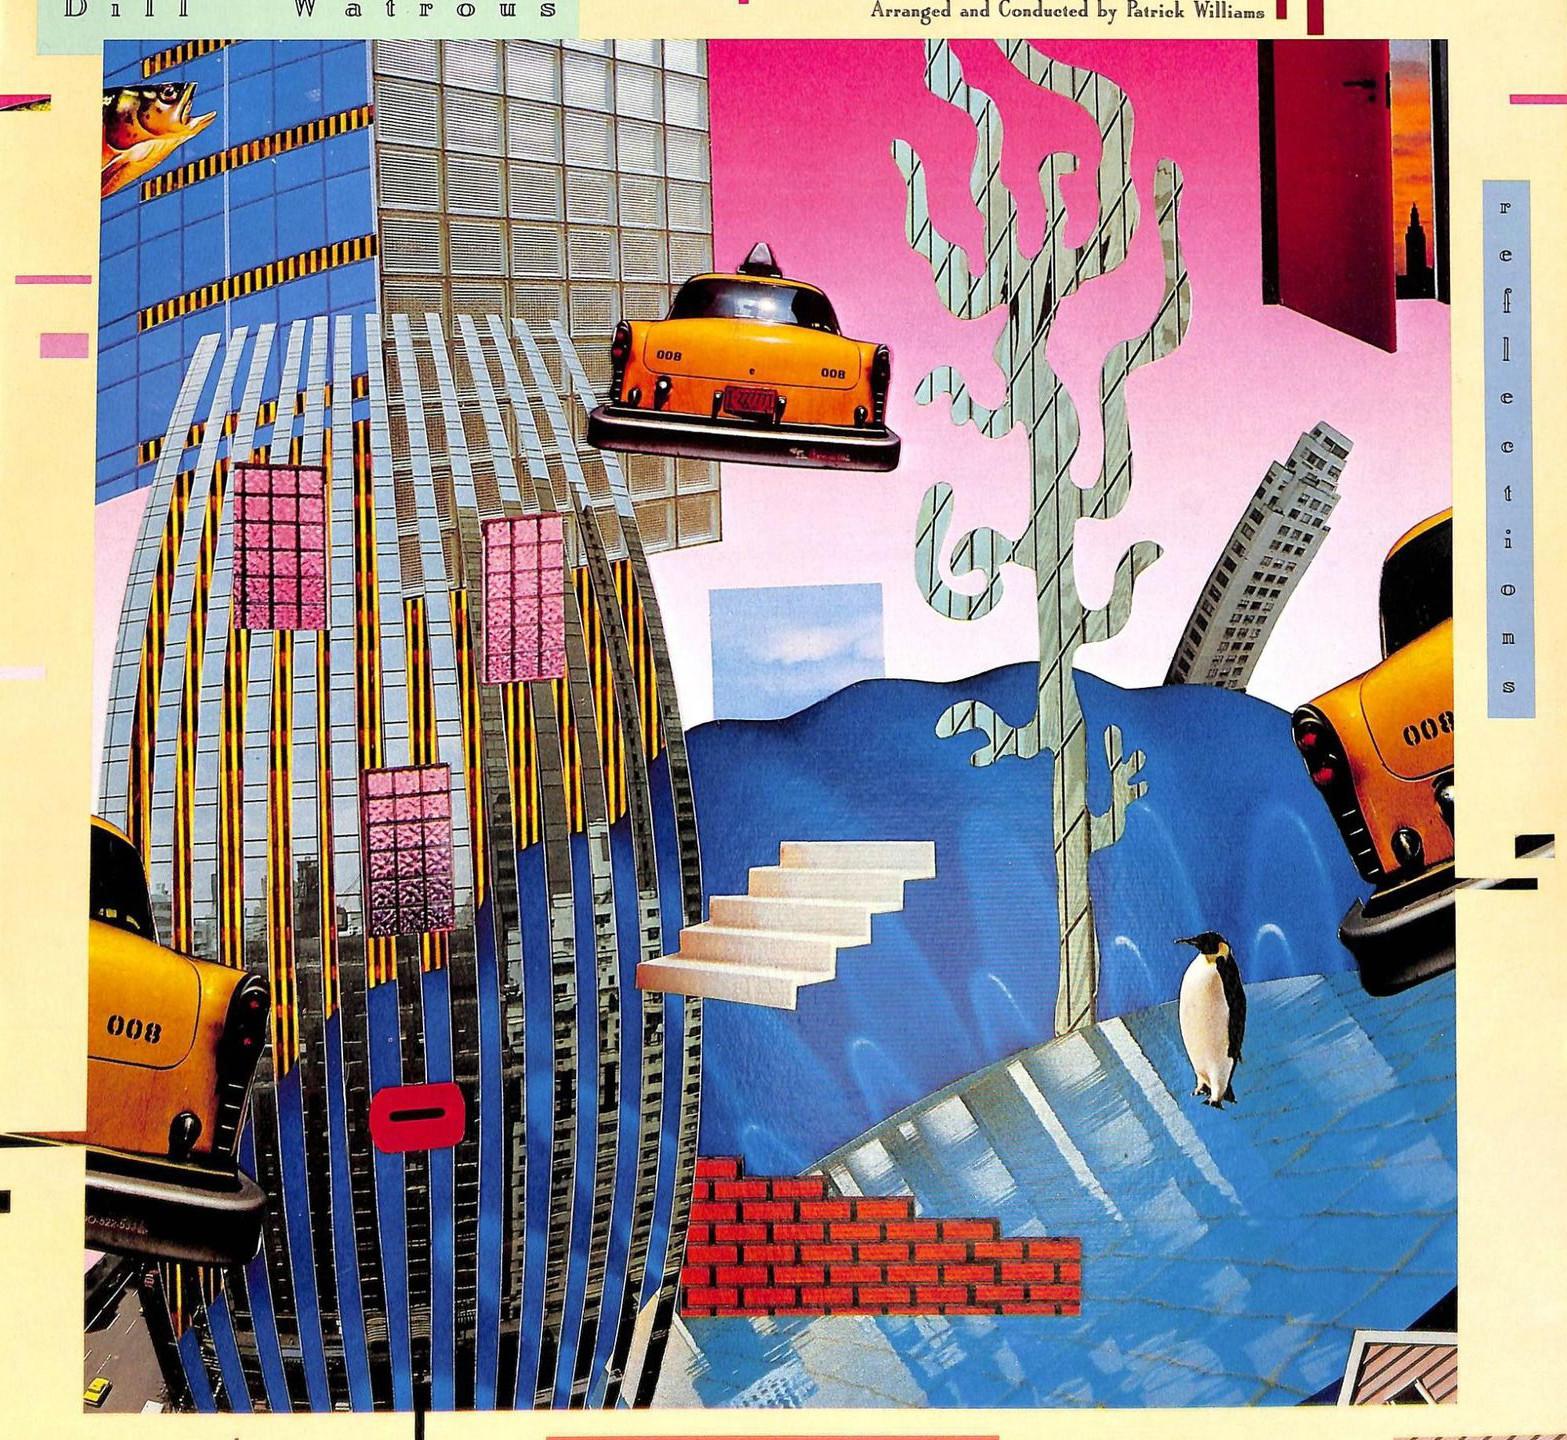 Bill Watrous - Reflections (Soundwings, 1987). Cover art by Lou Beach.